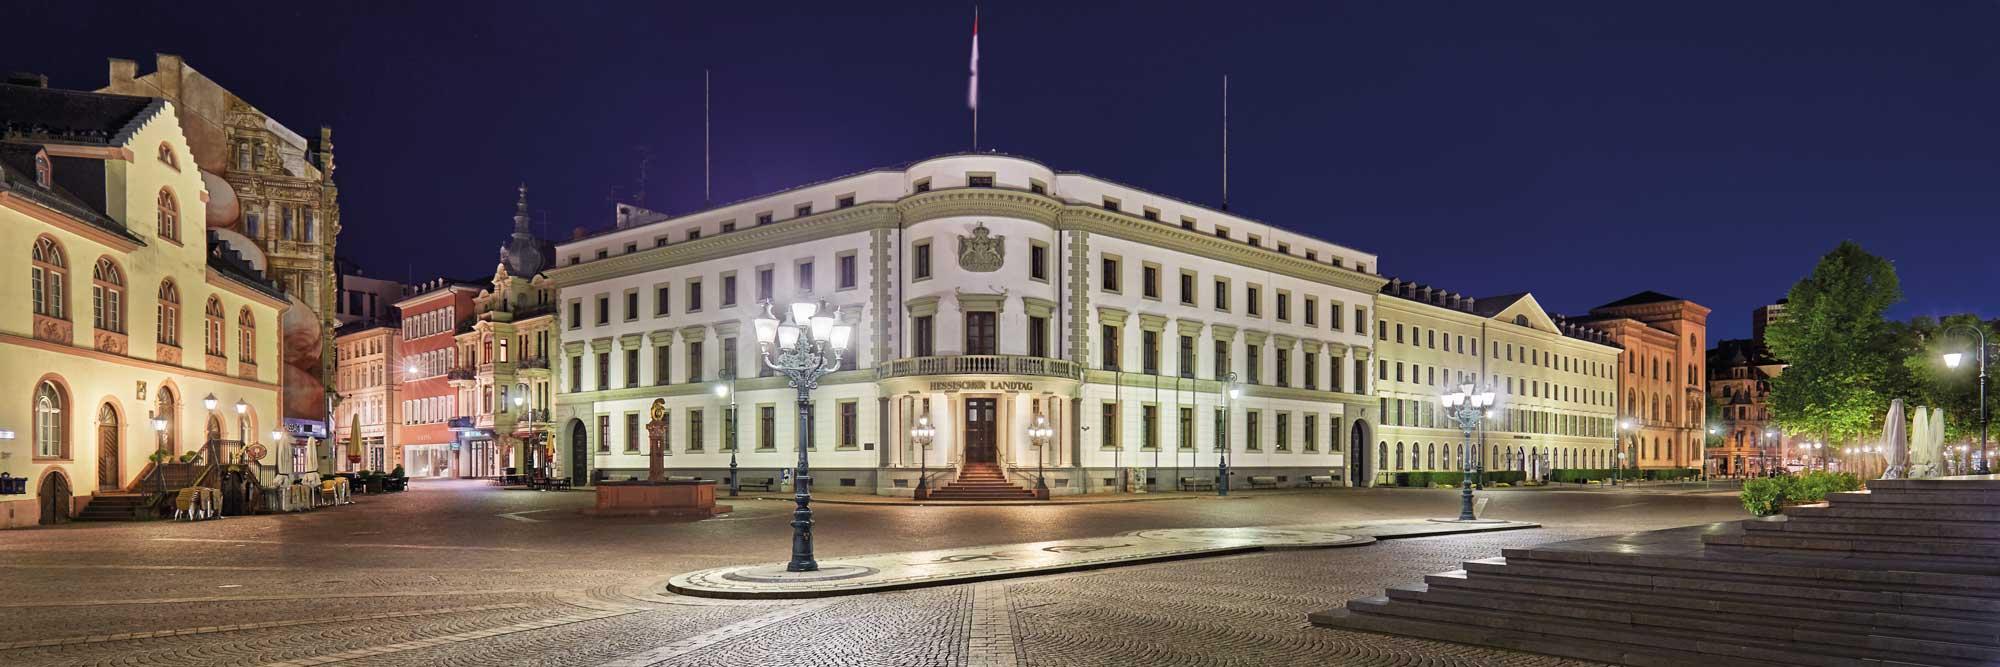 10-Wiesbaden-Landtag-um-5-vor-4